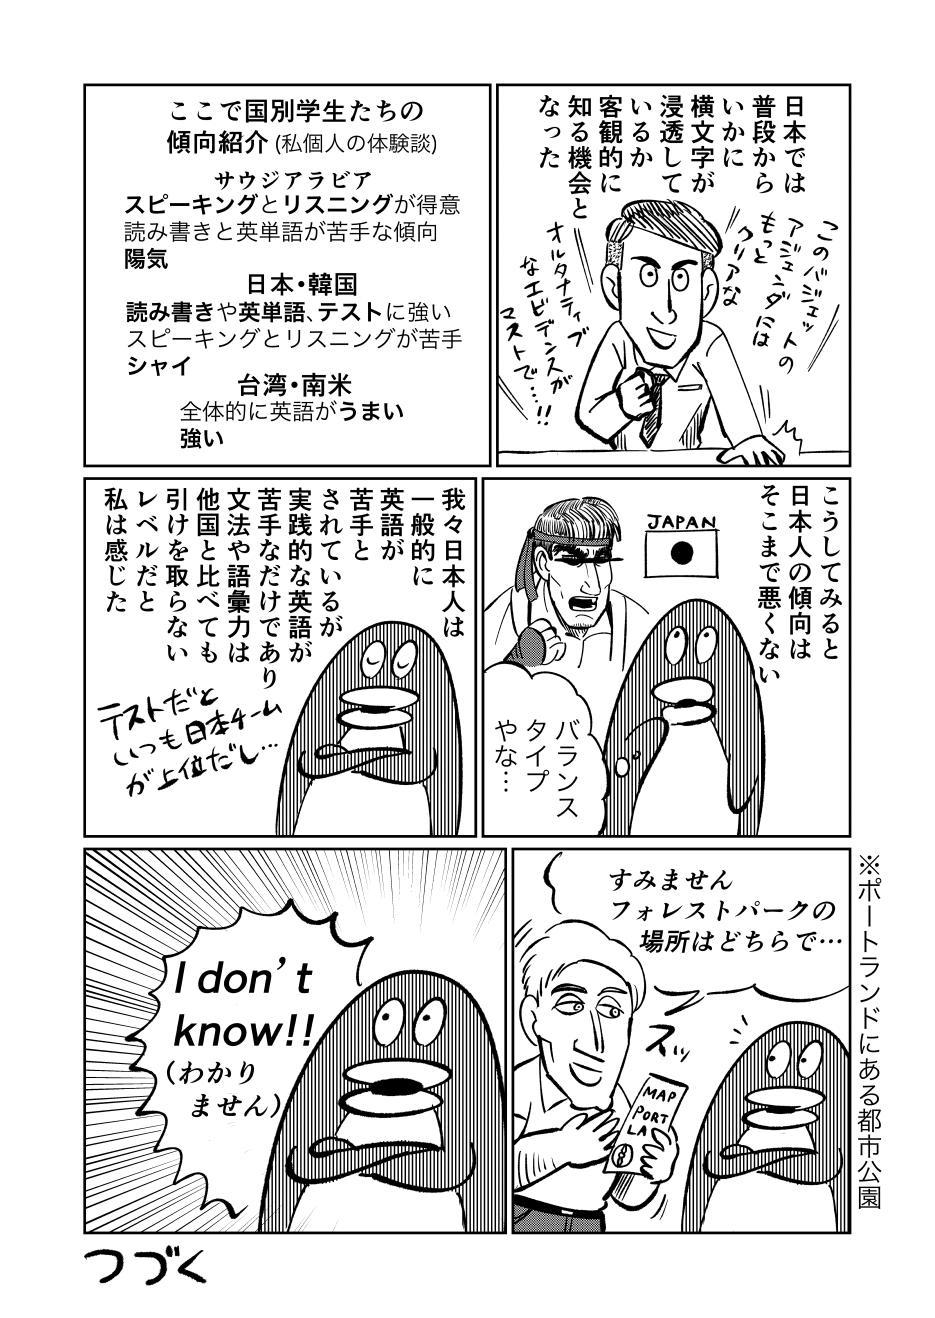 https://www.ryugaku.co.jp/blog/els_portland/upload/AB28E4CD-18E7-496A-ABB2-3401BDE08B9D.jpeg